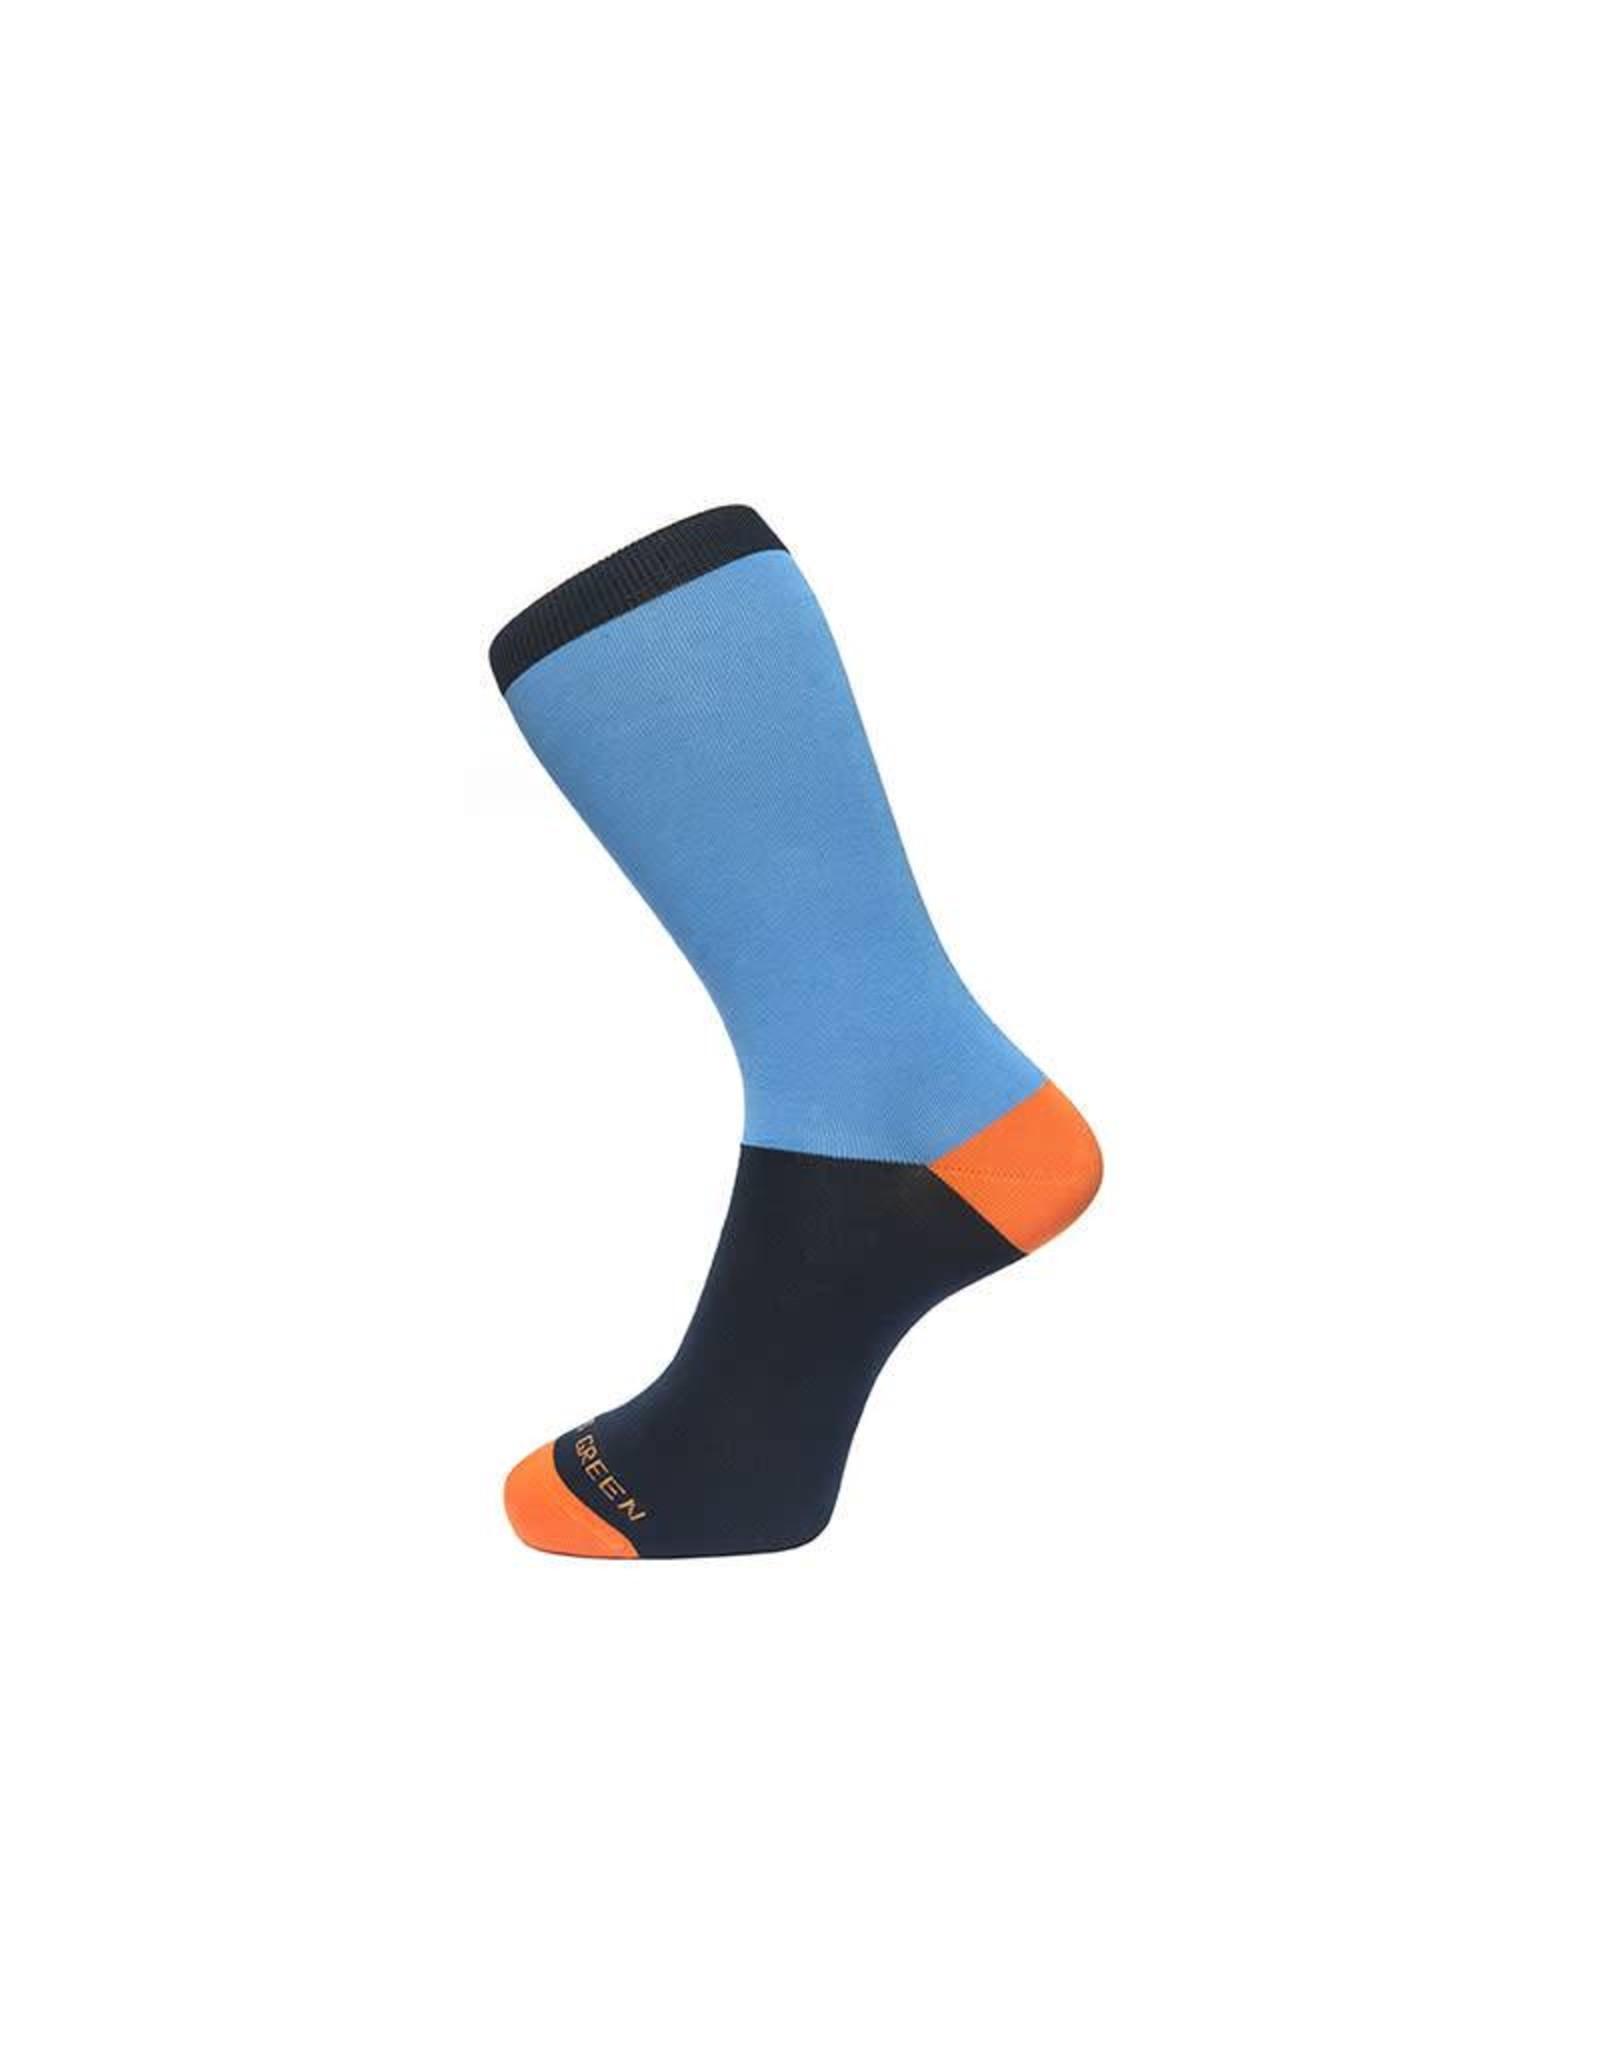 Block Colour Sock In Sky Blue